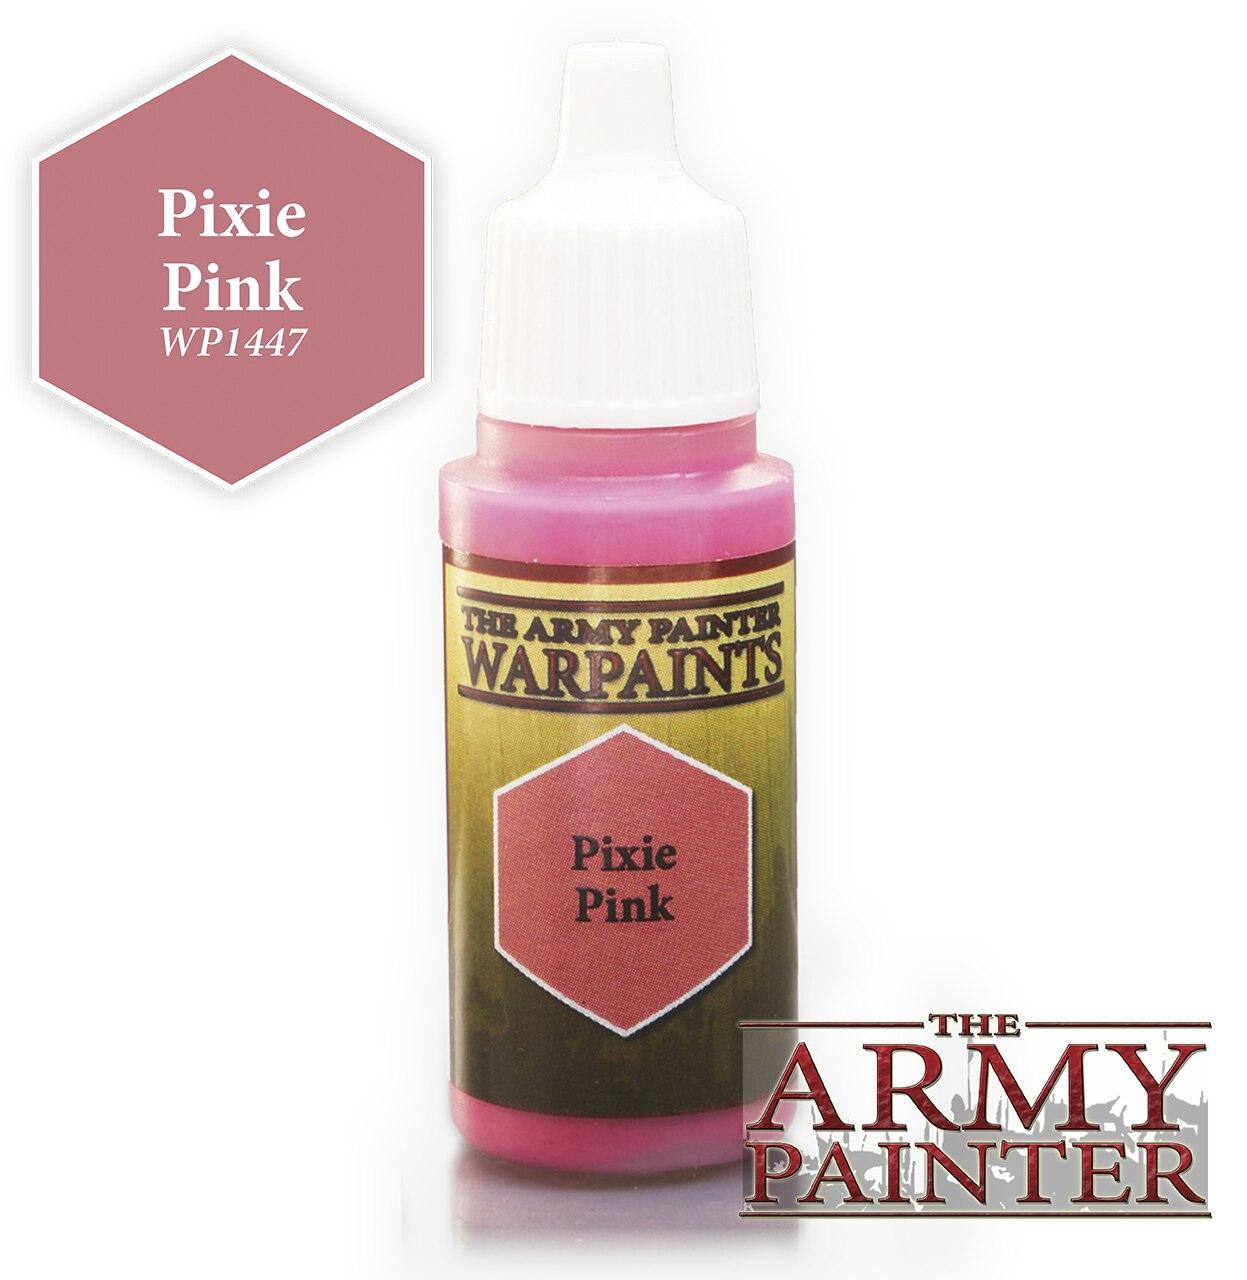 Army Painter Warpaint - Pixie Pink